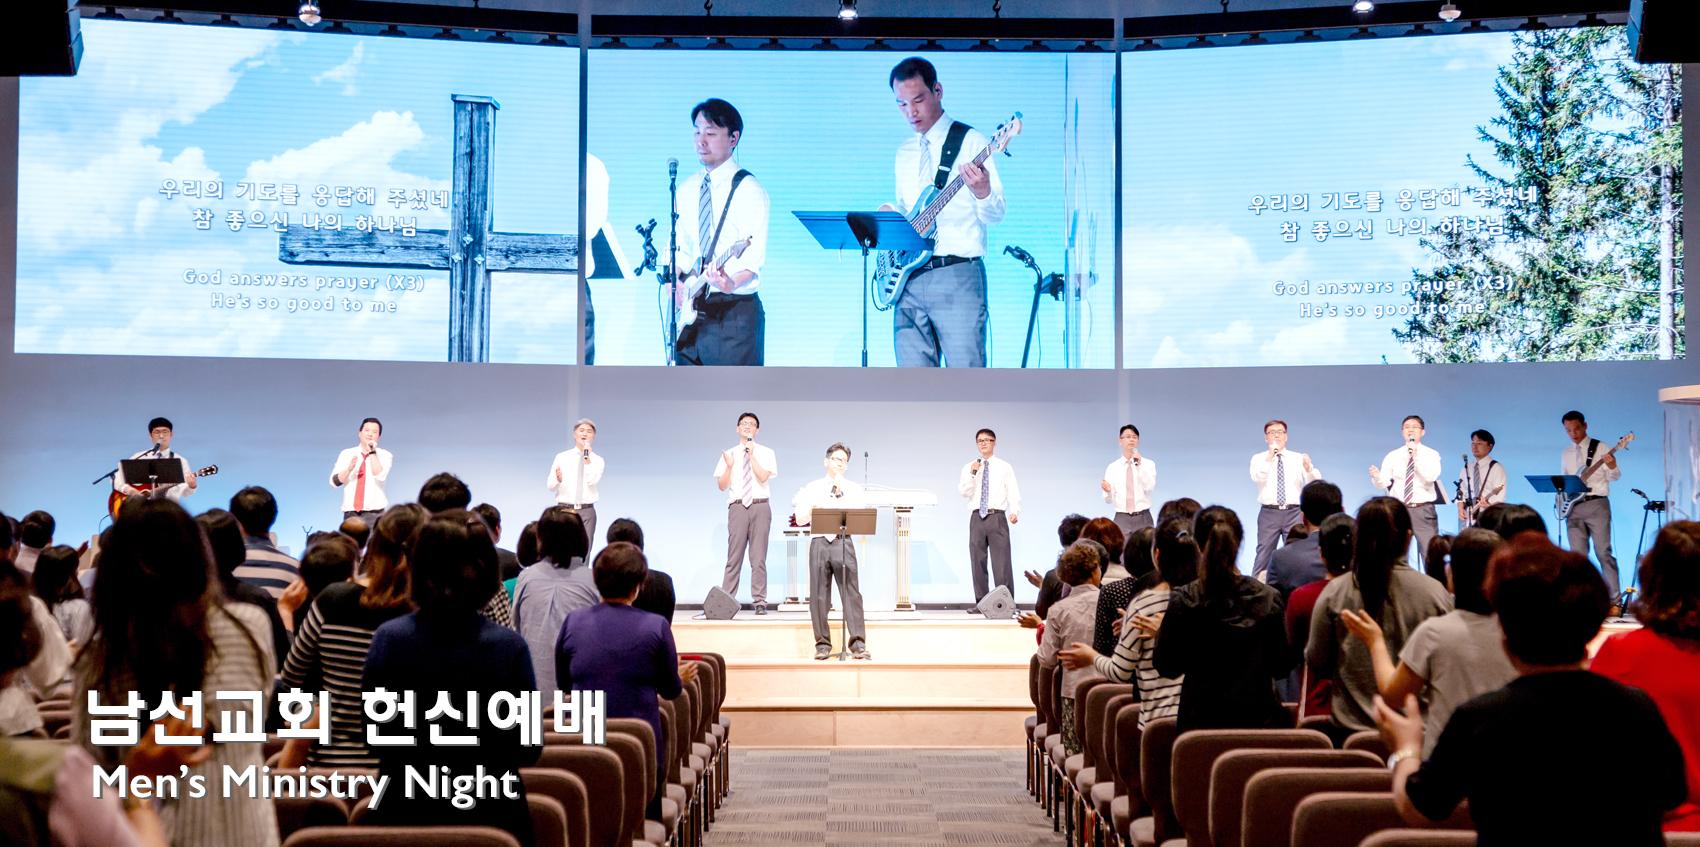 Men's Ministry Night